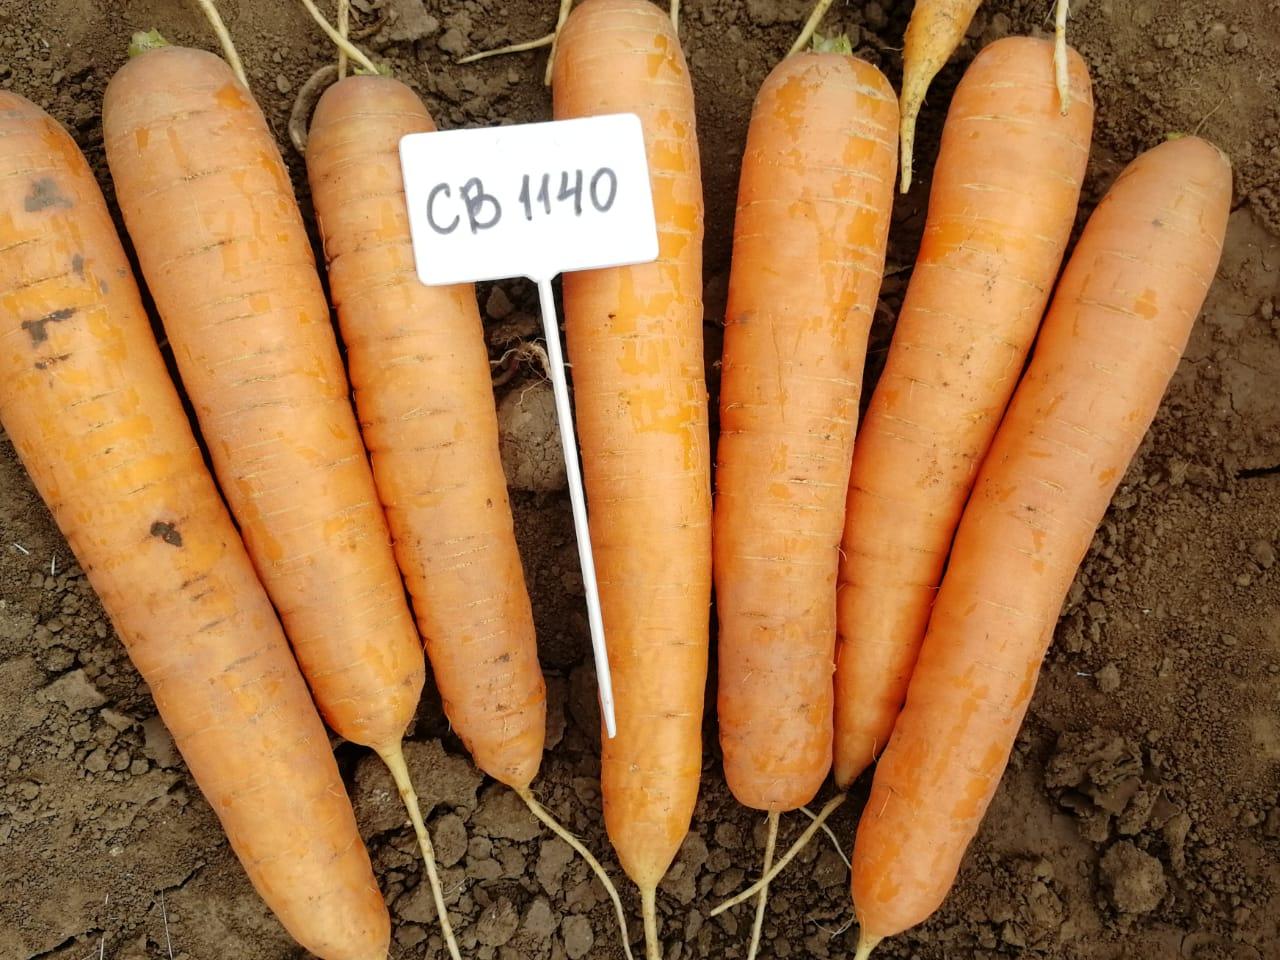 Seminis - морковь СВ 1140